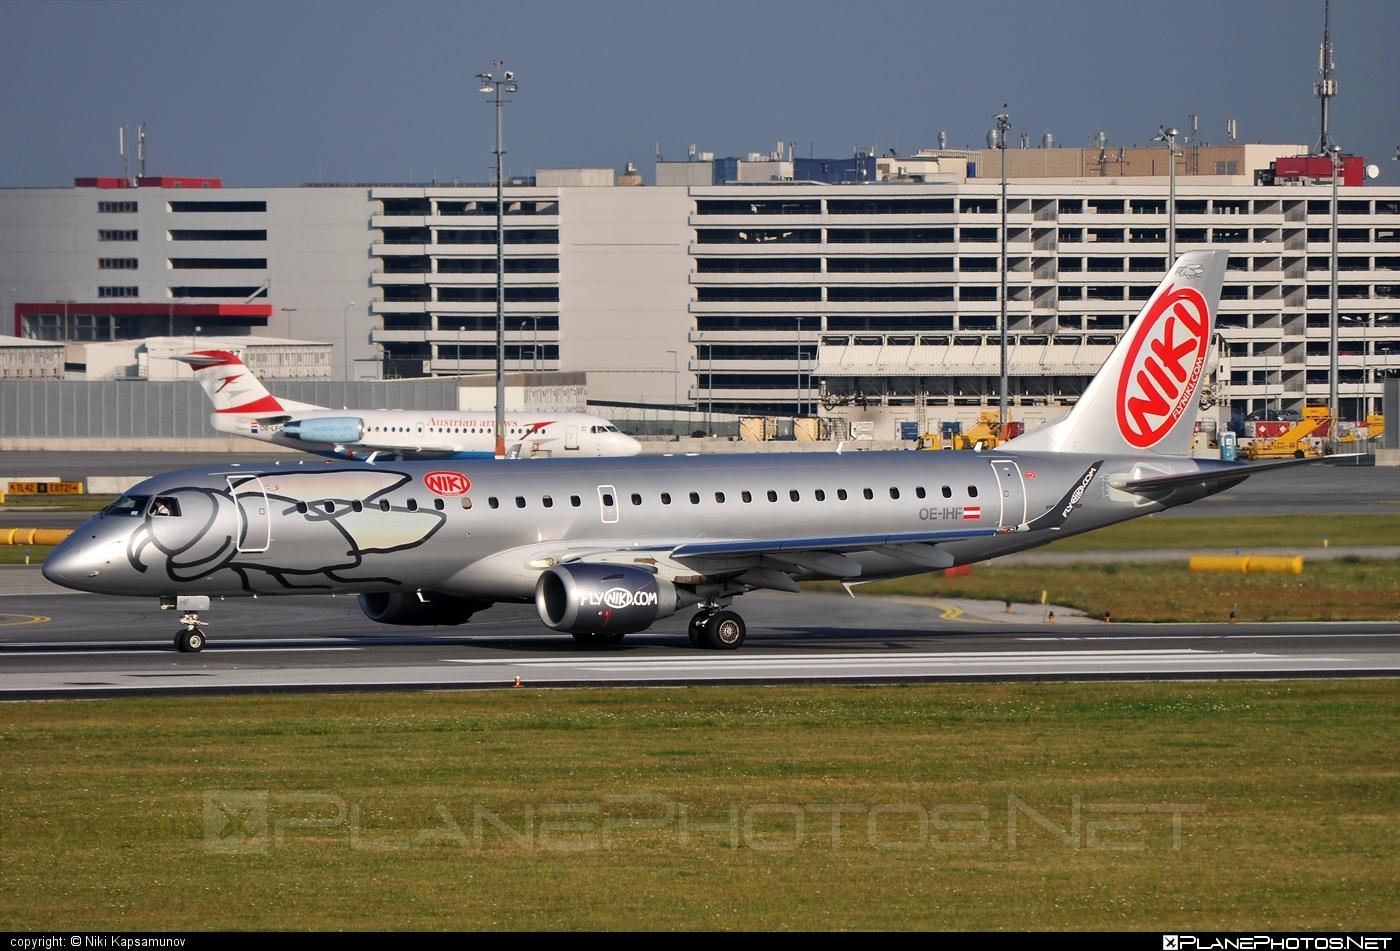 Embraer E190LR (ERJ-190-100LR) - OE-IHF operated by Niki #e190 #e190100 #e190100lr #e190lr #embraer #embraer190 #embraer190100lr #embraer190lr #flyniki #niki